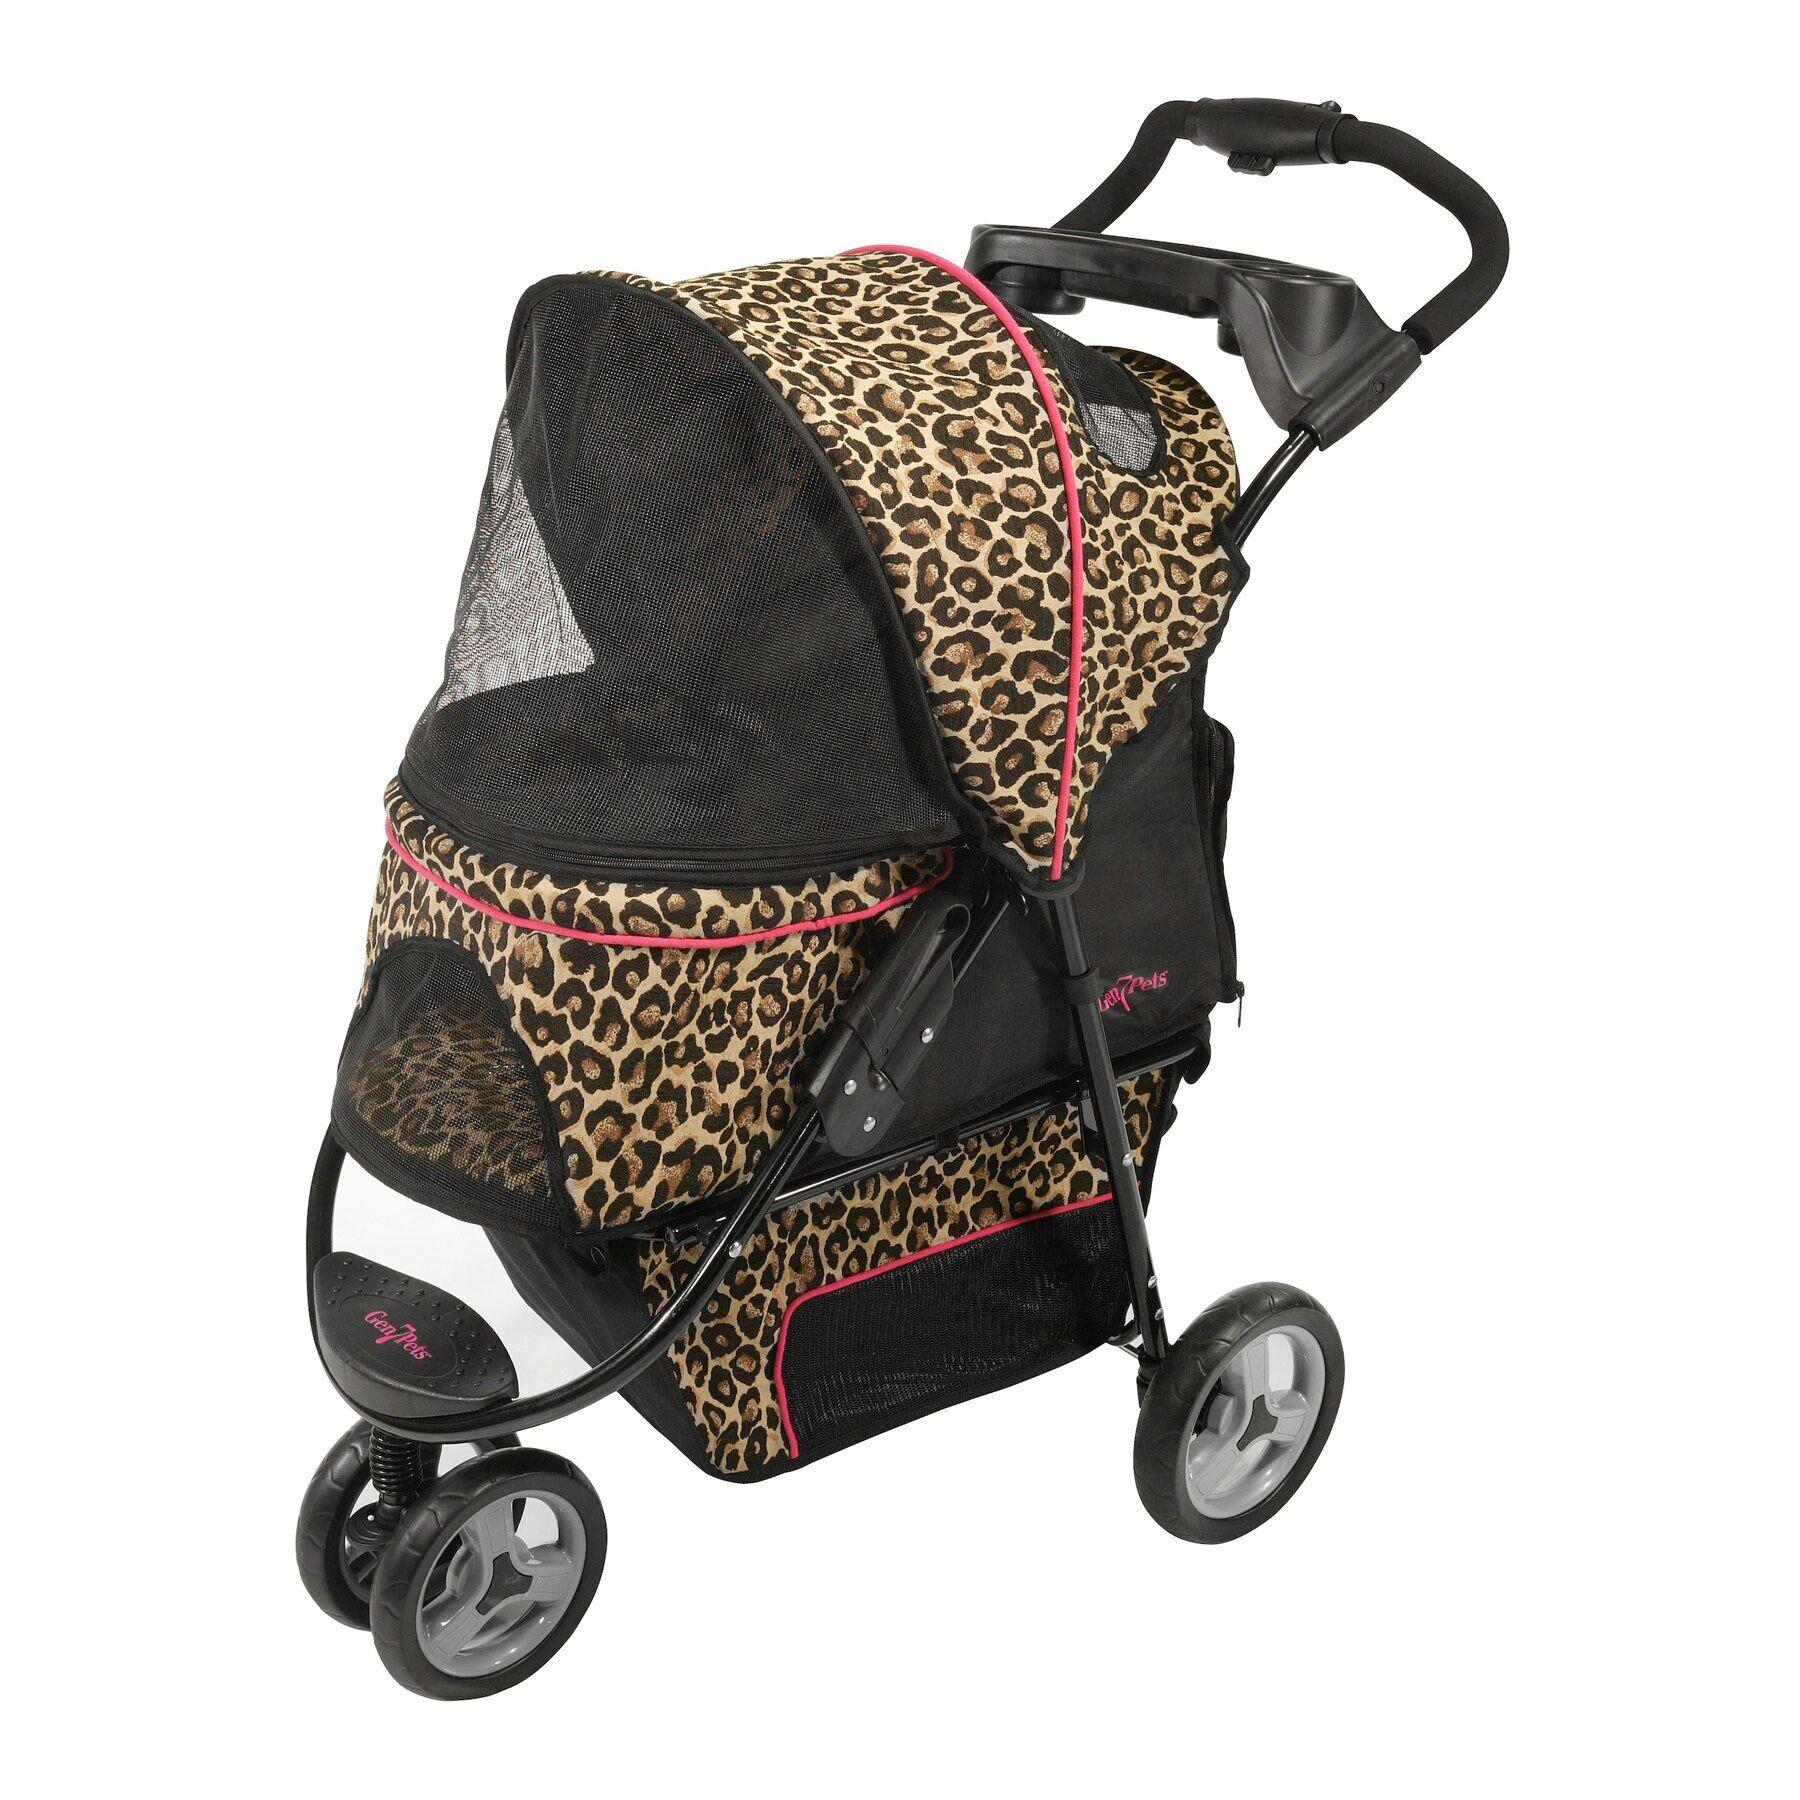 Gen7Pets Cheetah Promenade Pet Stroller